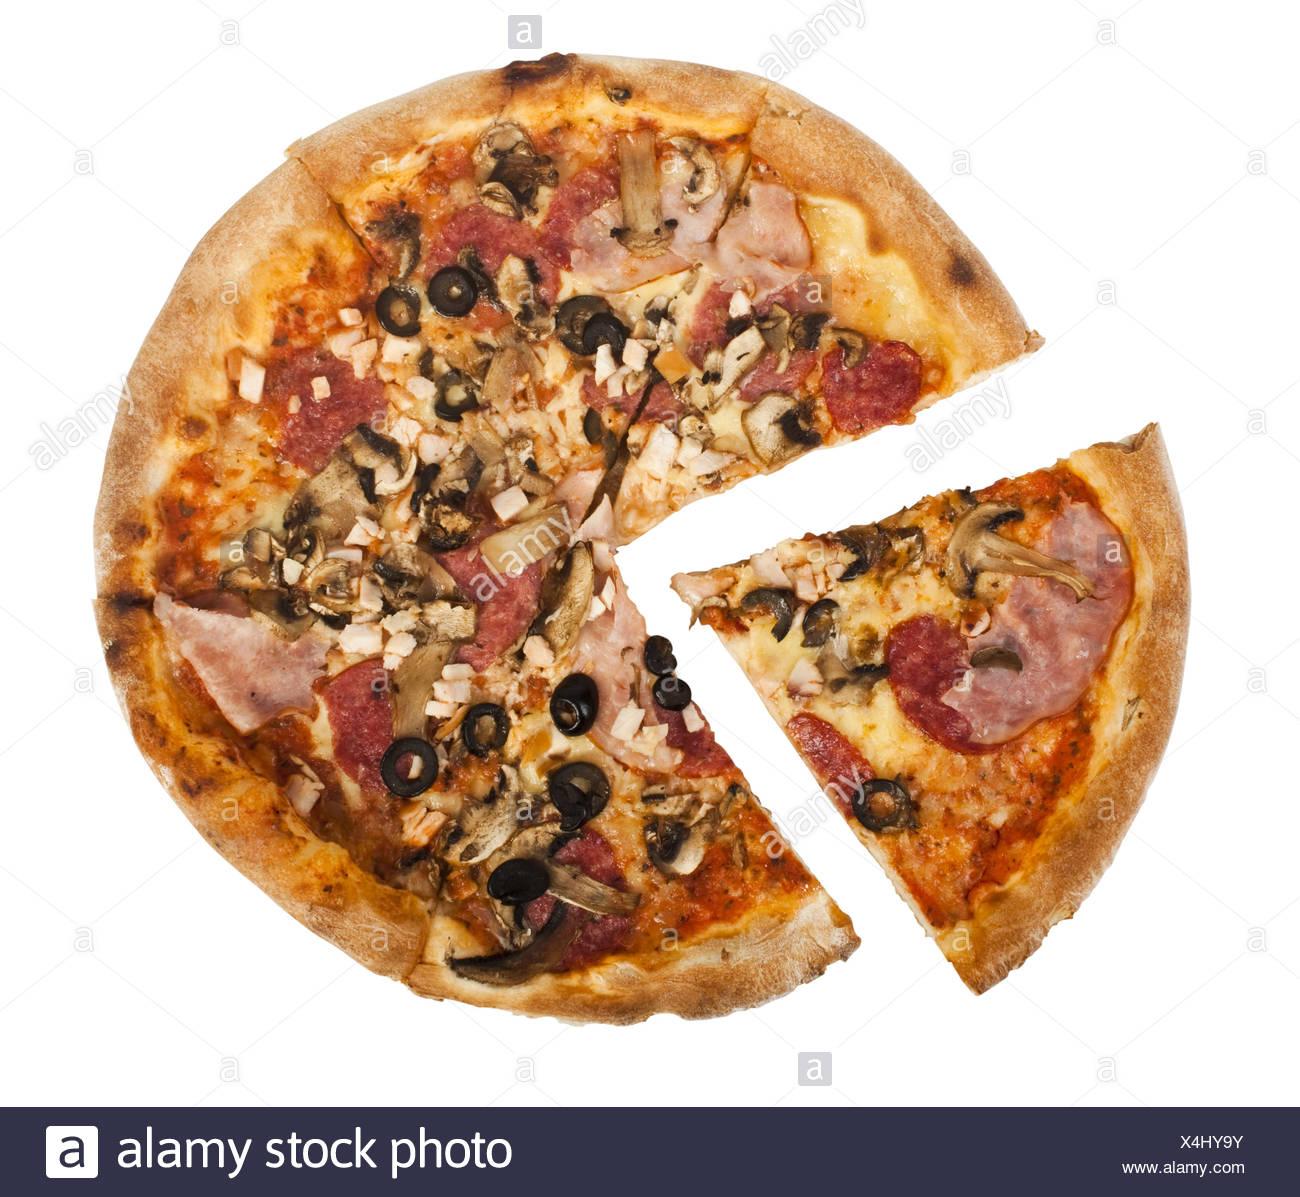 Pizza Pepperoni - Stock Image